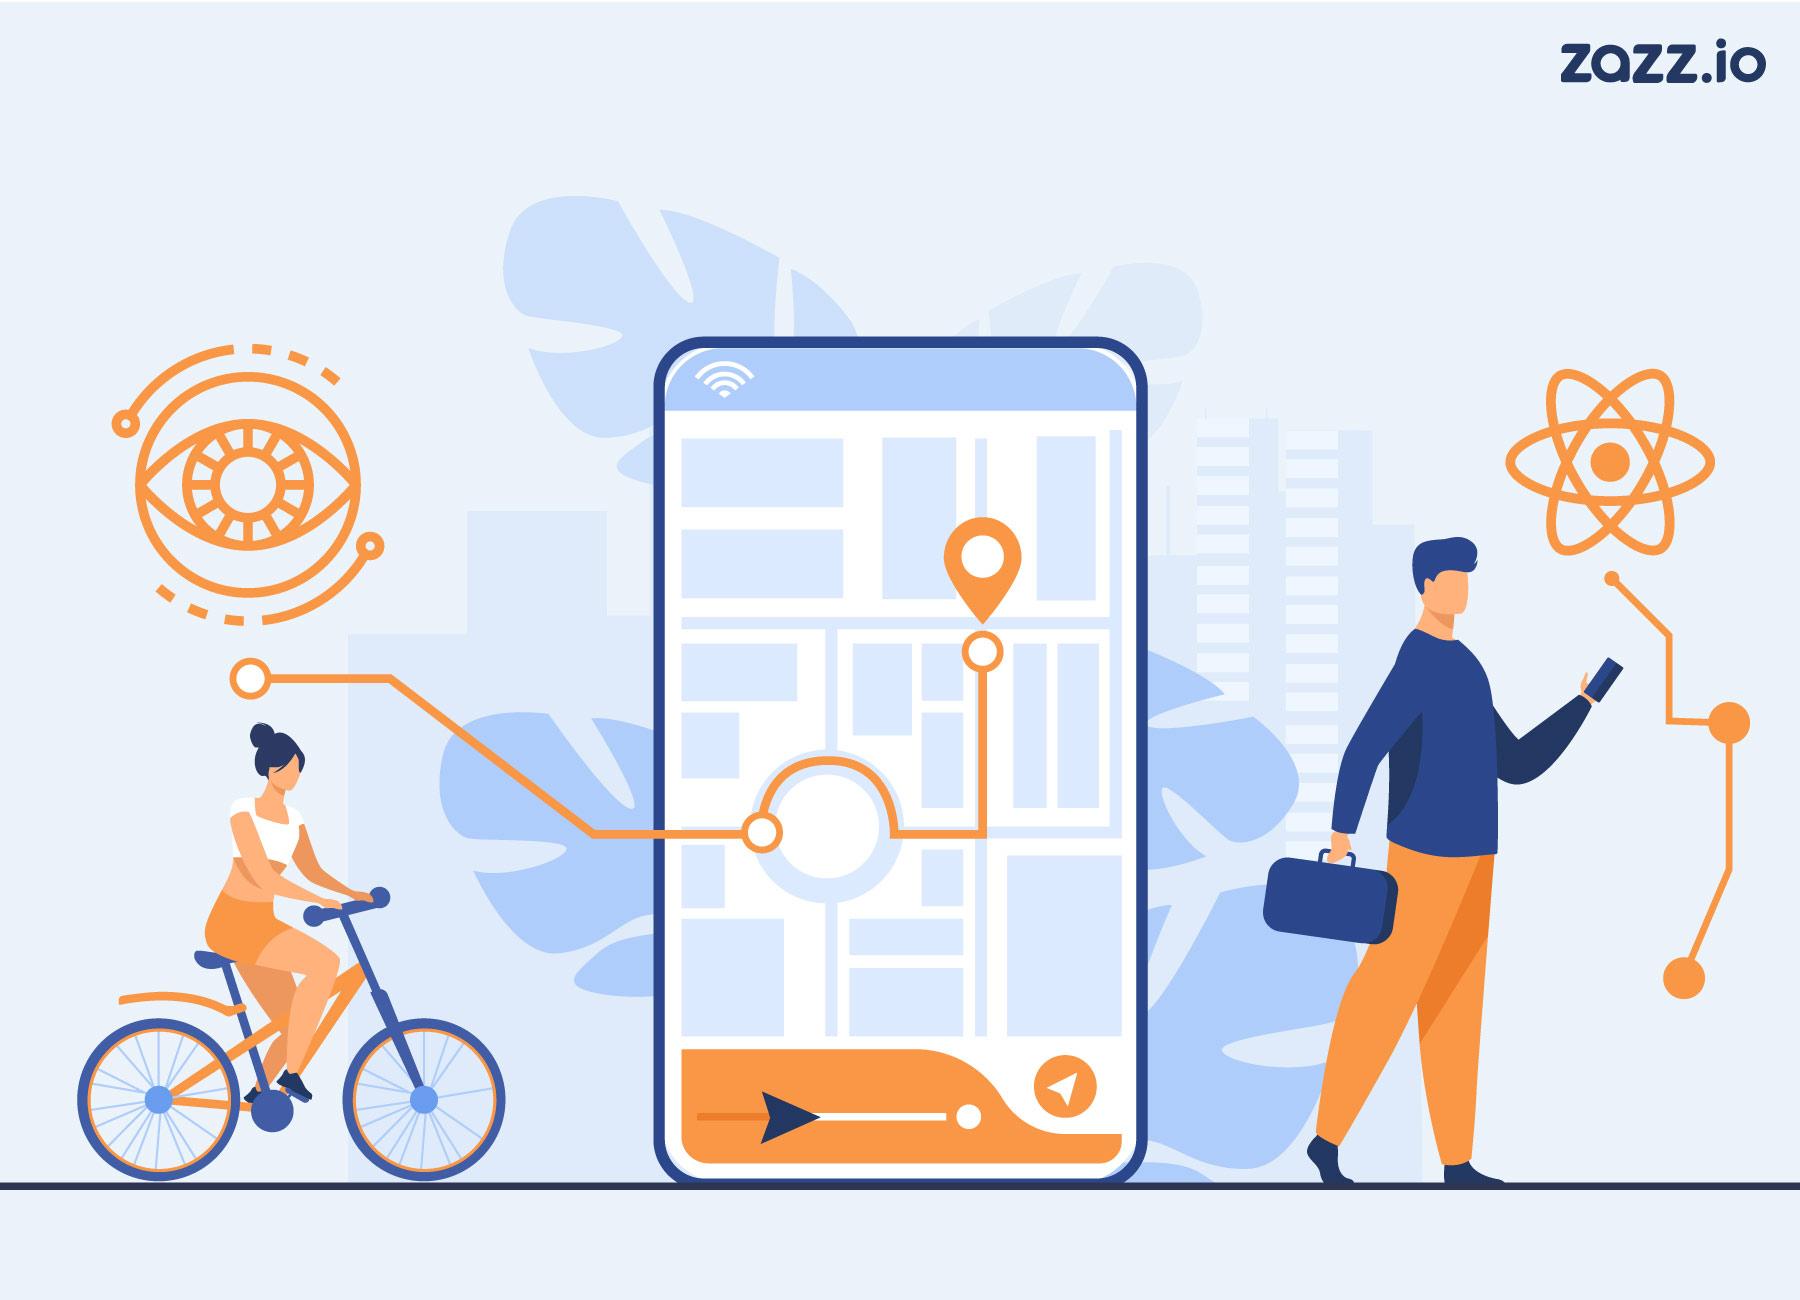 Recognition Mobile AppRecognition Mobile App